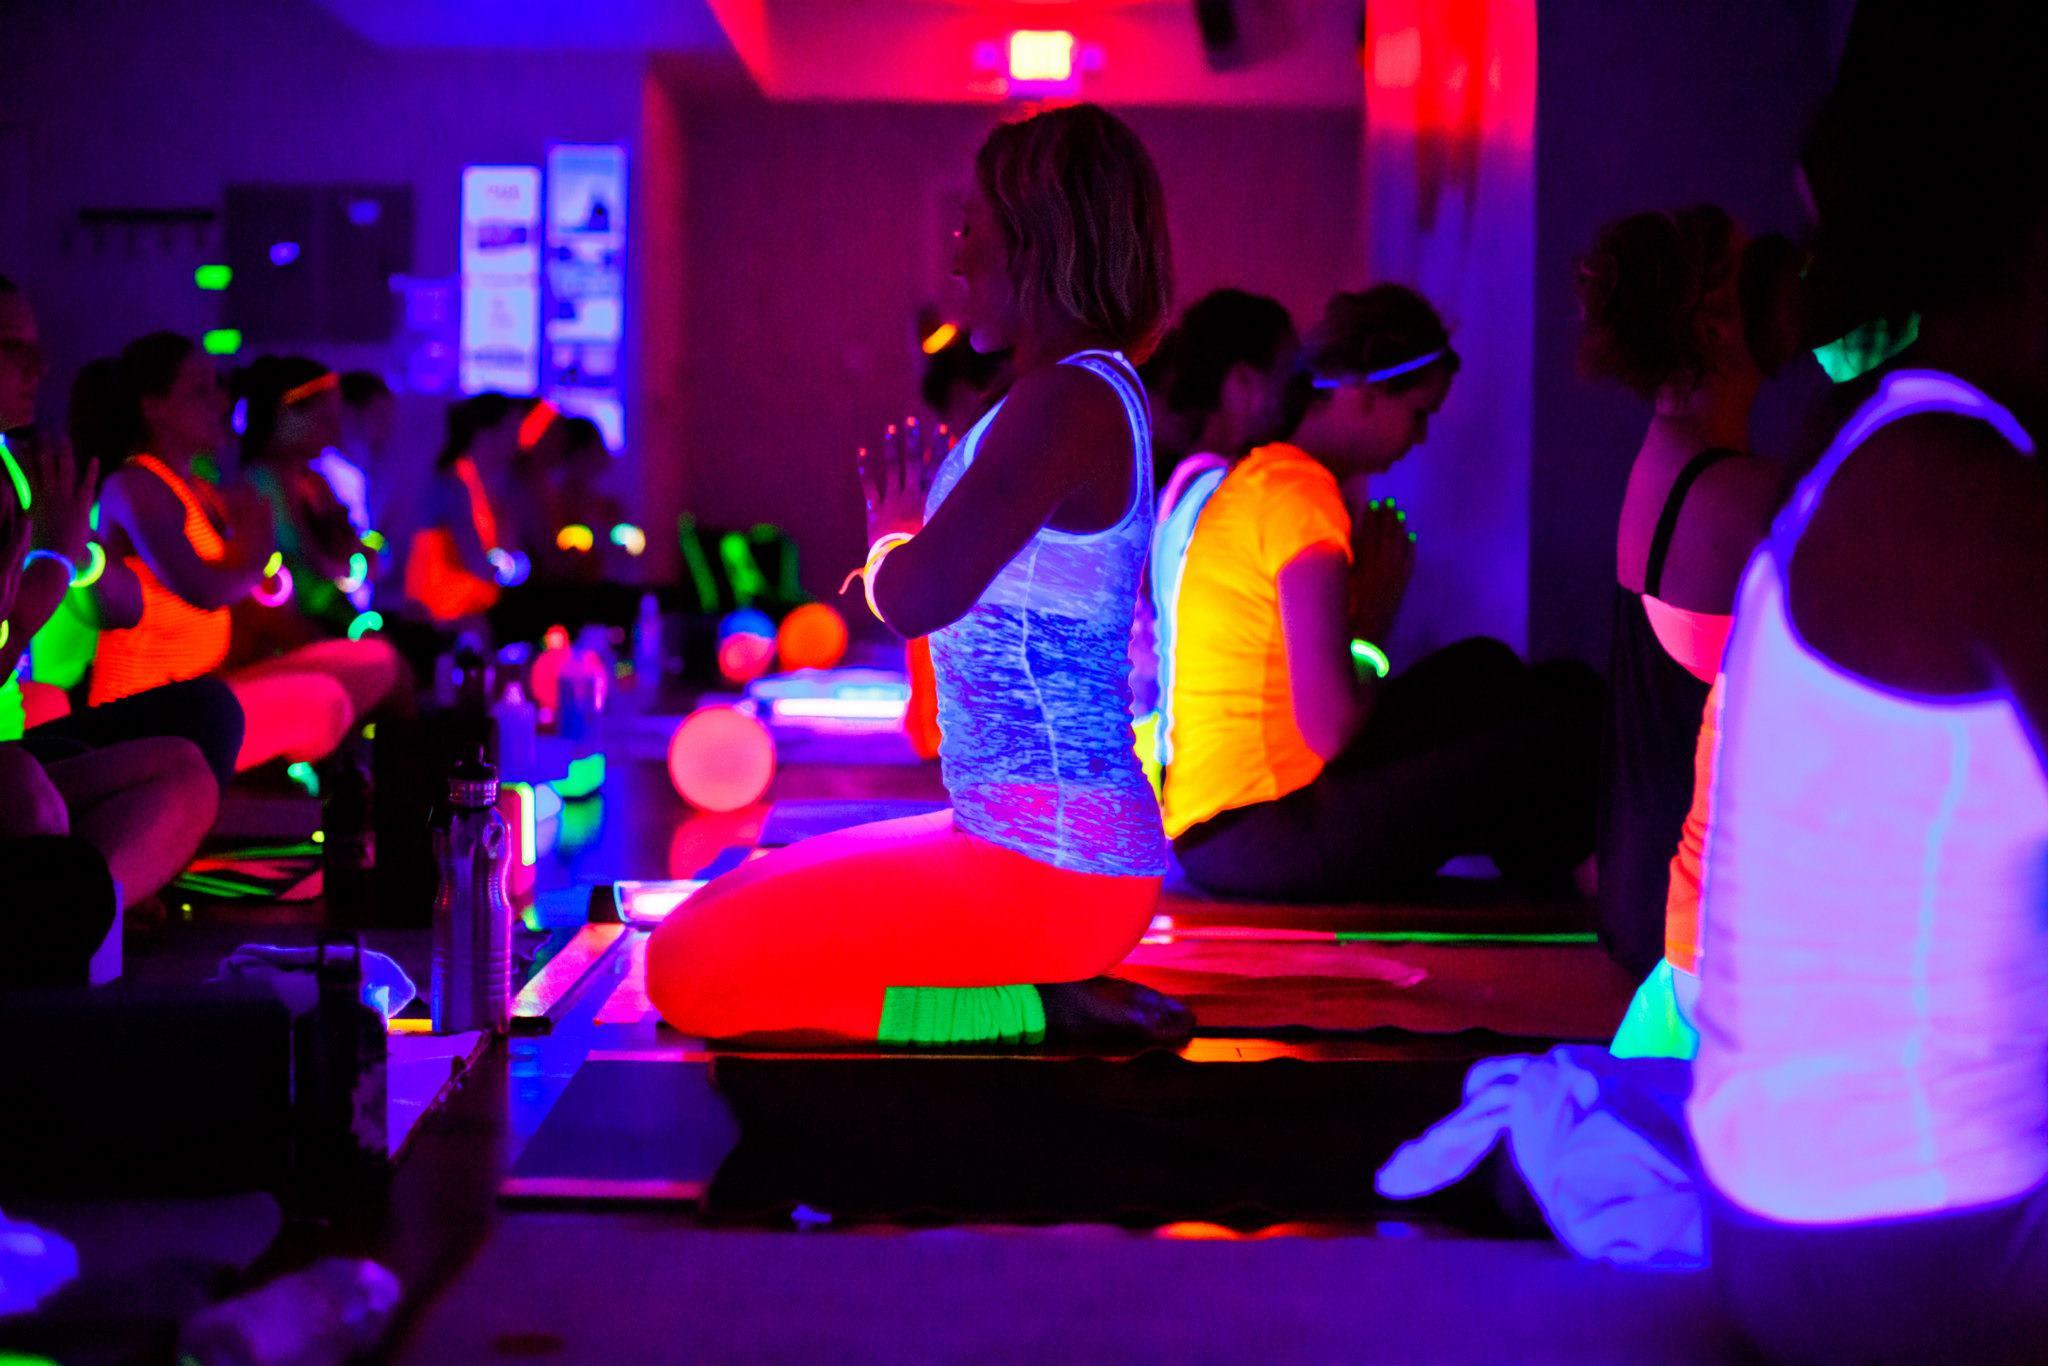 Glow Fitness Uvm Bored